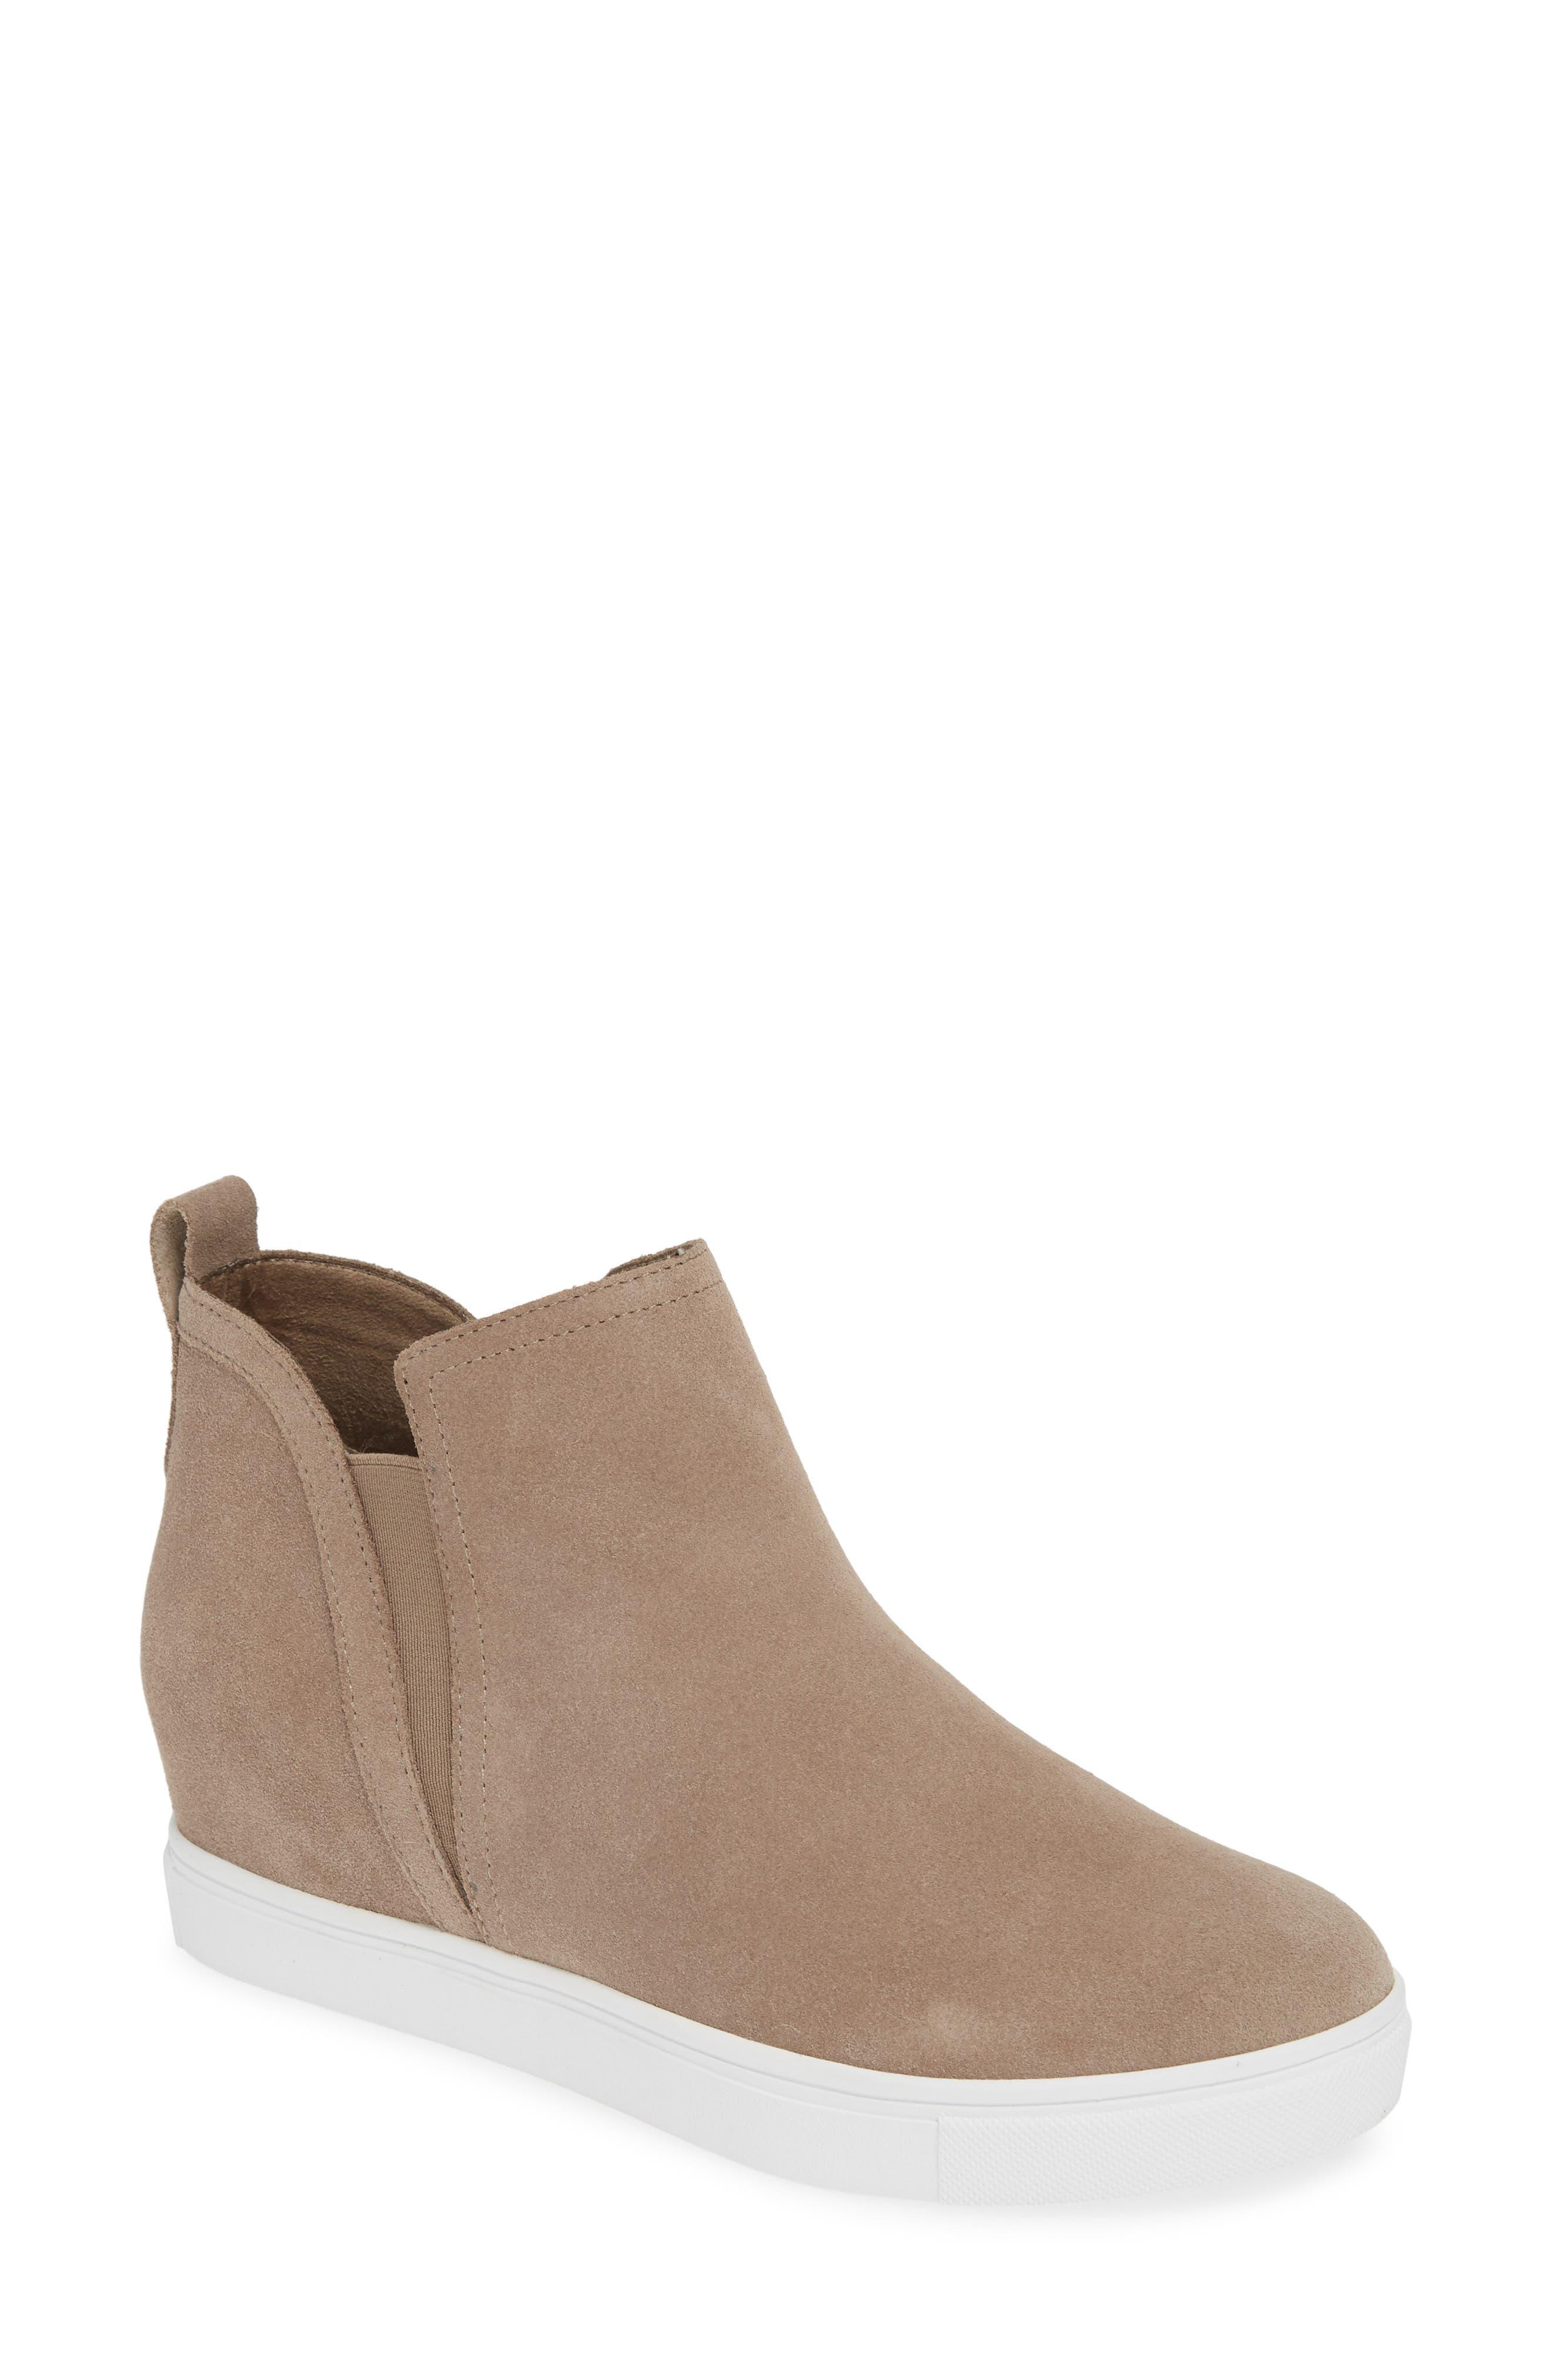 Blondo Georgette Waterproof Hidden Wedge Sneaker (Women)